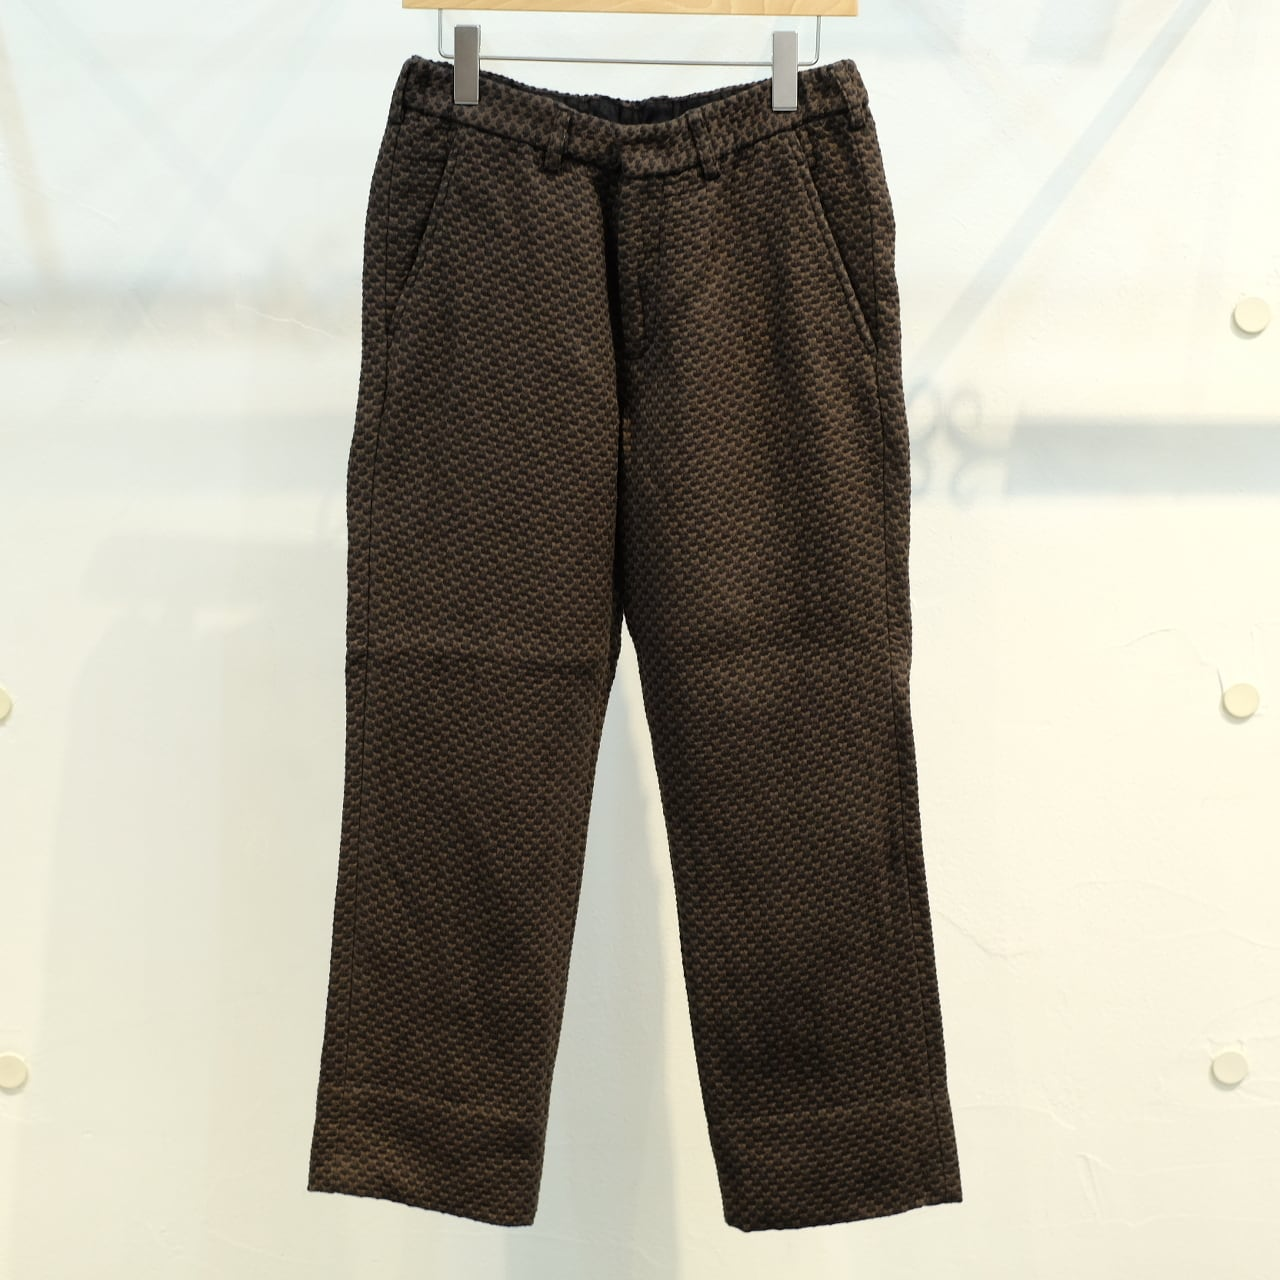 KUON(クオン) 二重十字刺し子織 ロングパンツ 表泥色バージョン